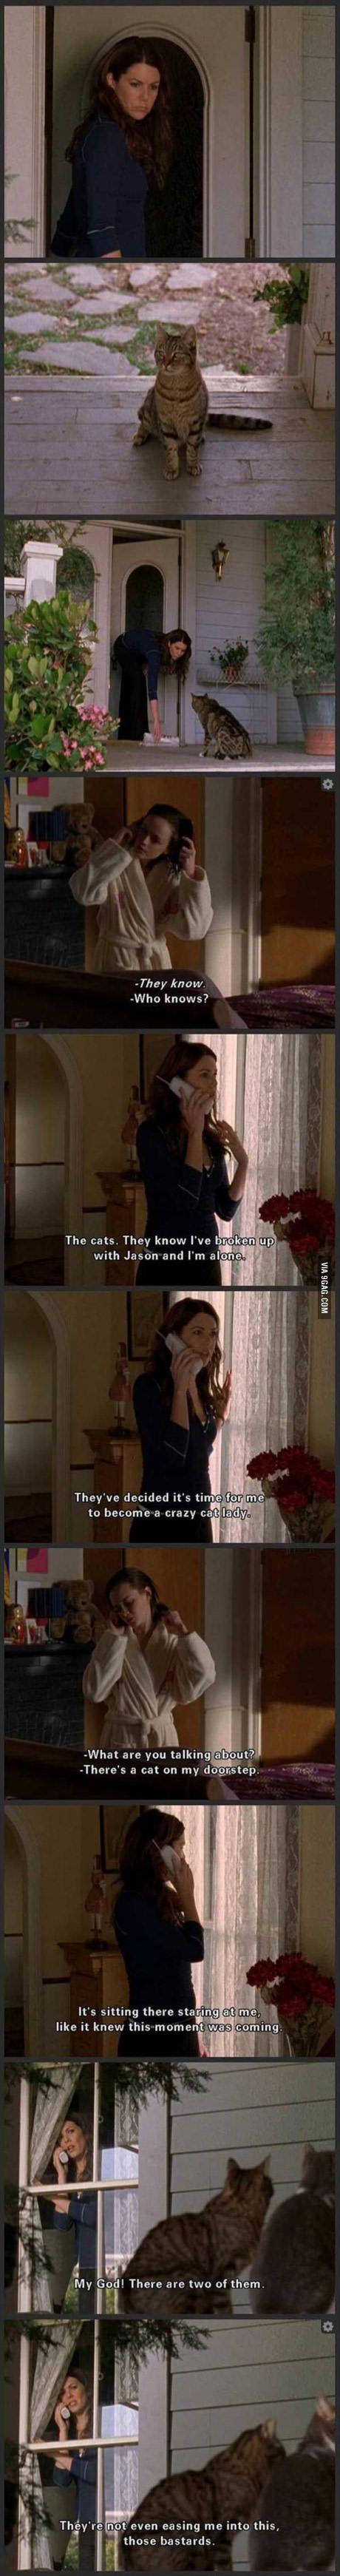 I miss Gilmore Girls                                                                                                                                                     More